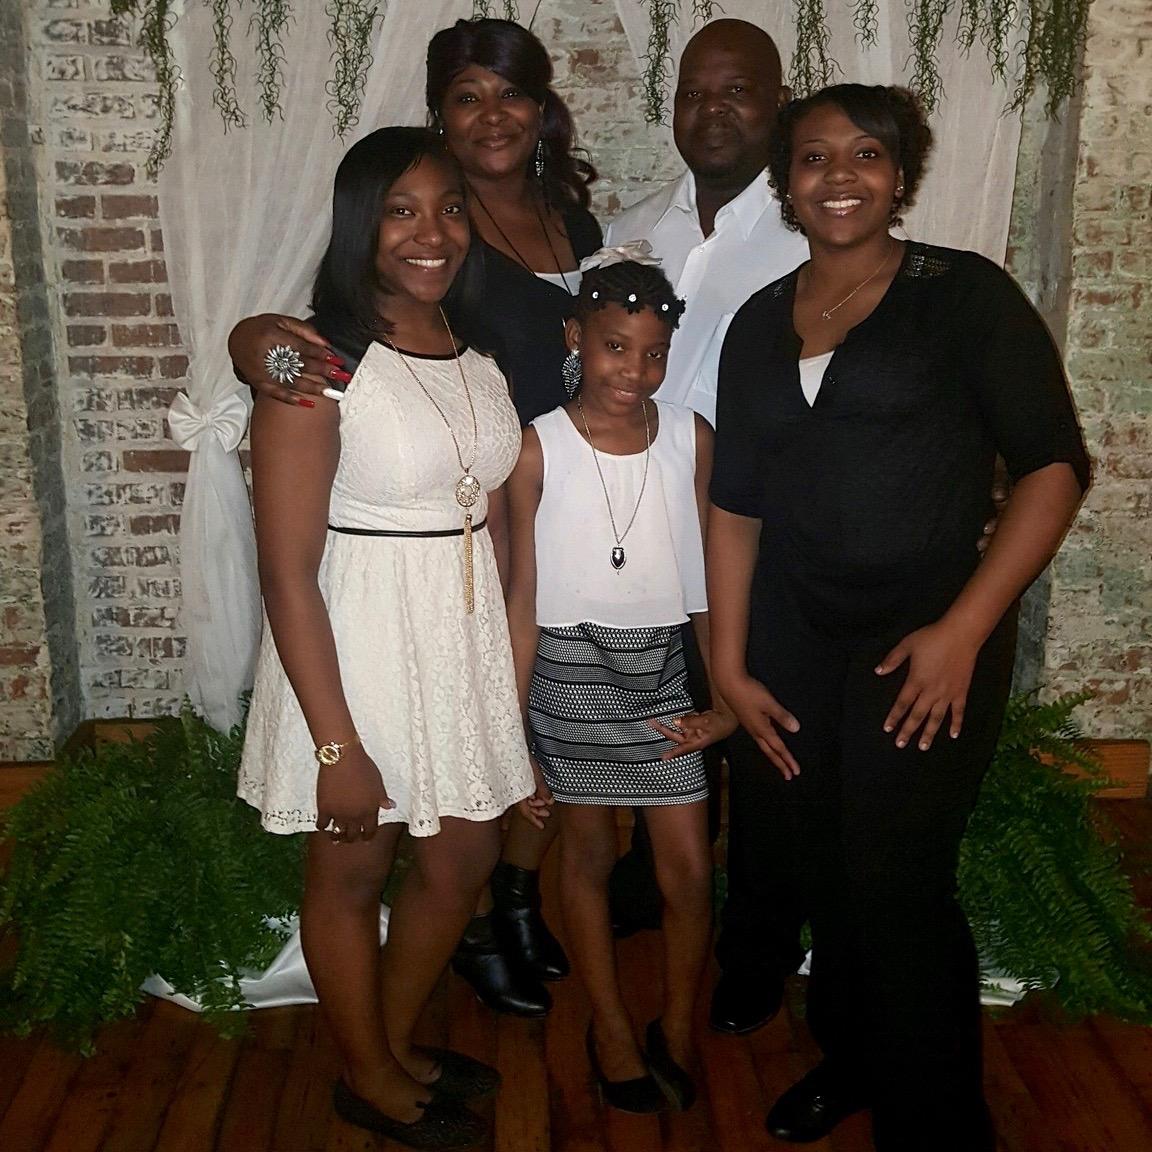 Ebony sisters